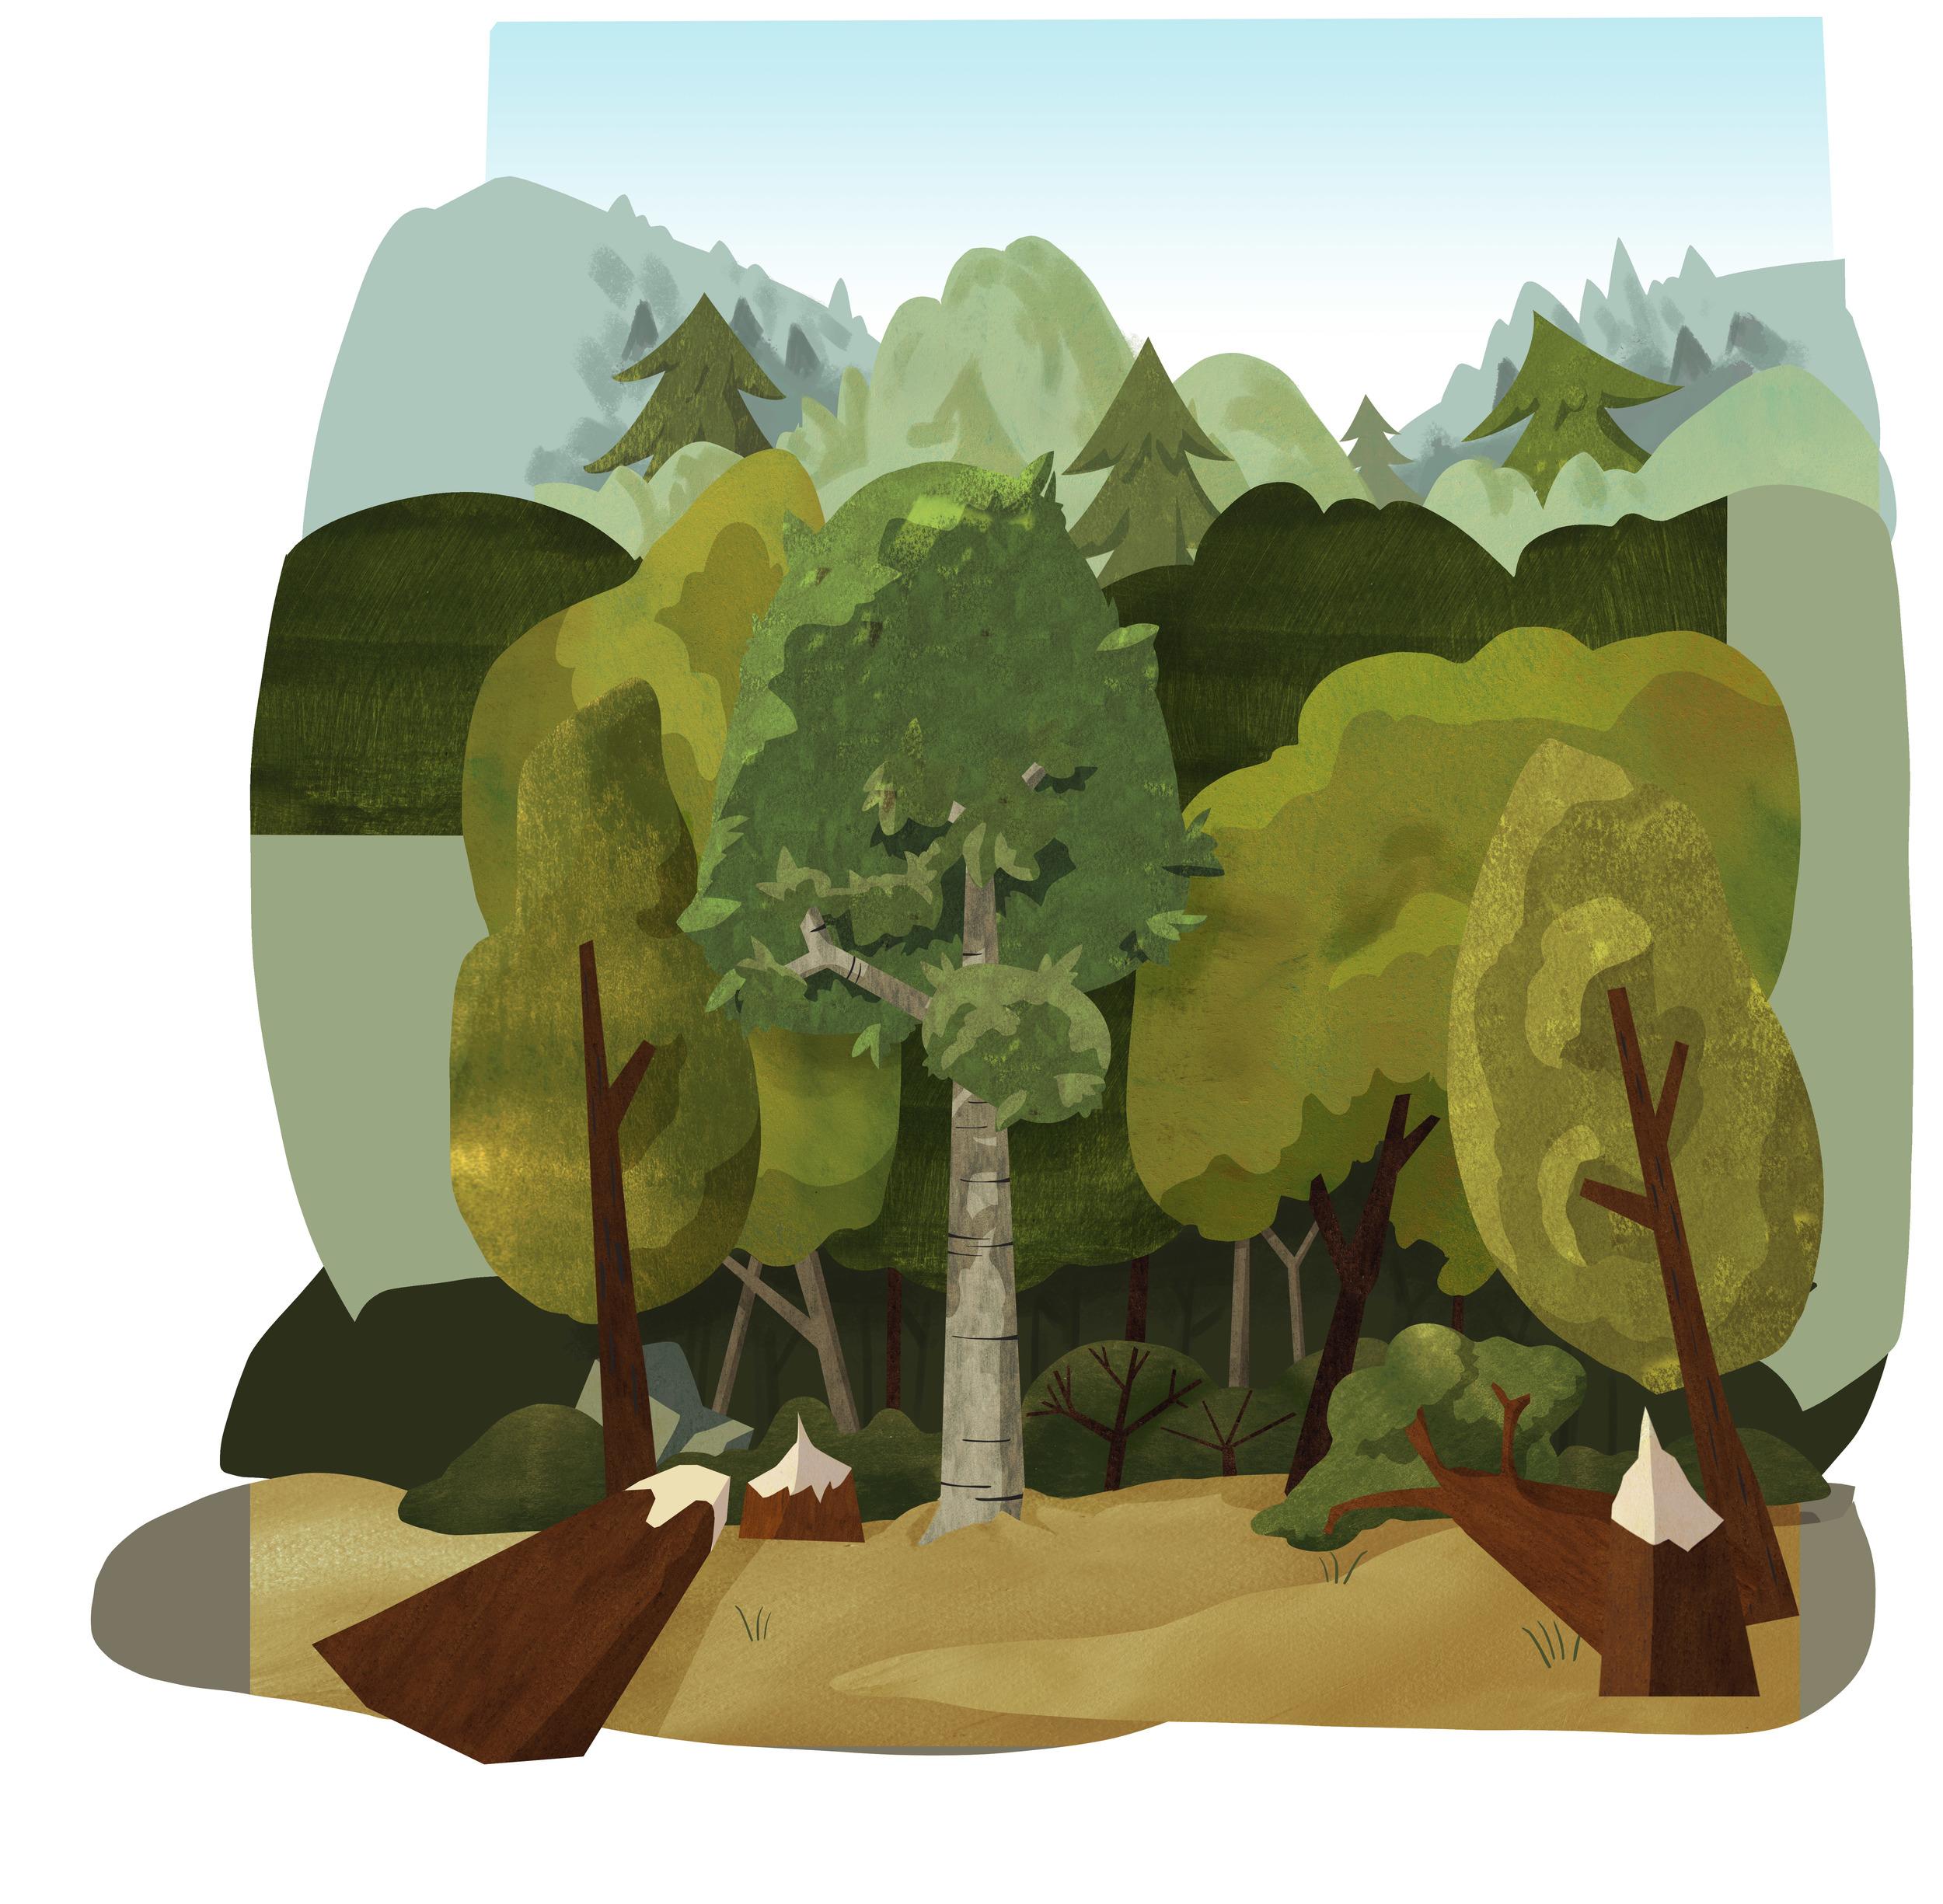 Intro_Sc01-cutting-trees-layout-v2.jpg